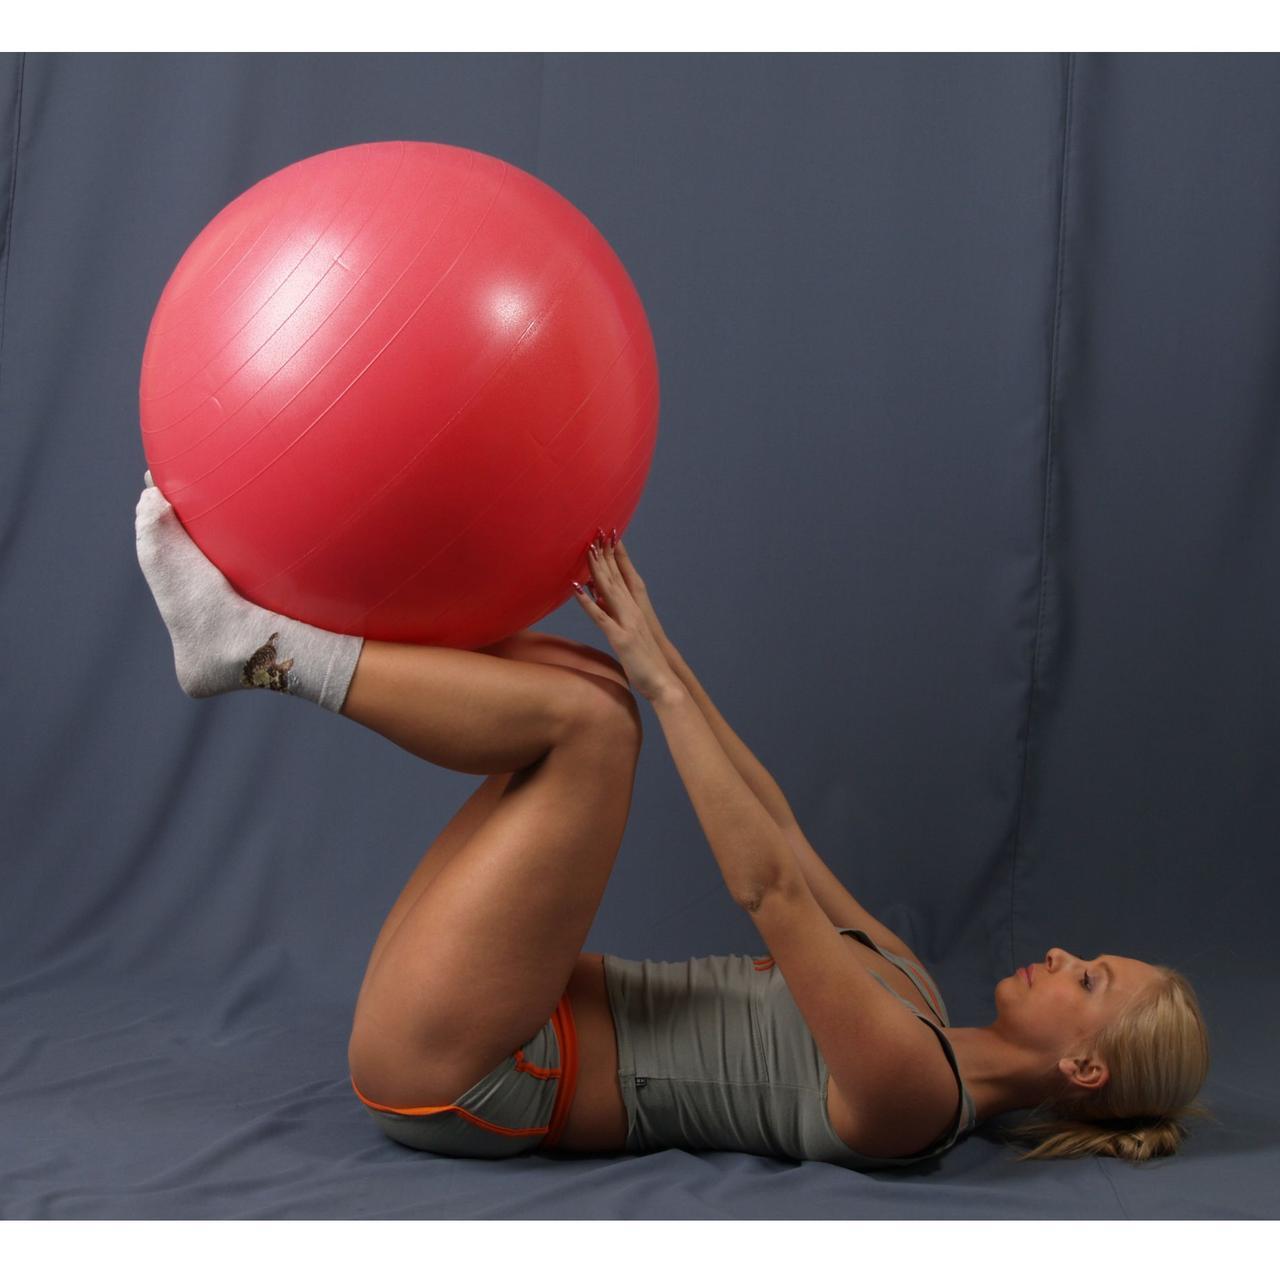 Гимнастический мяч (фитбол) 60 см - фото 5